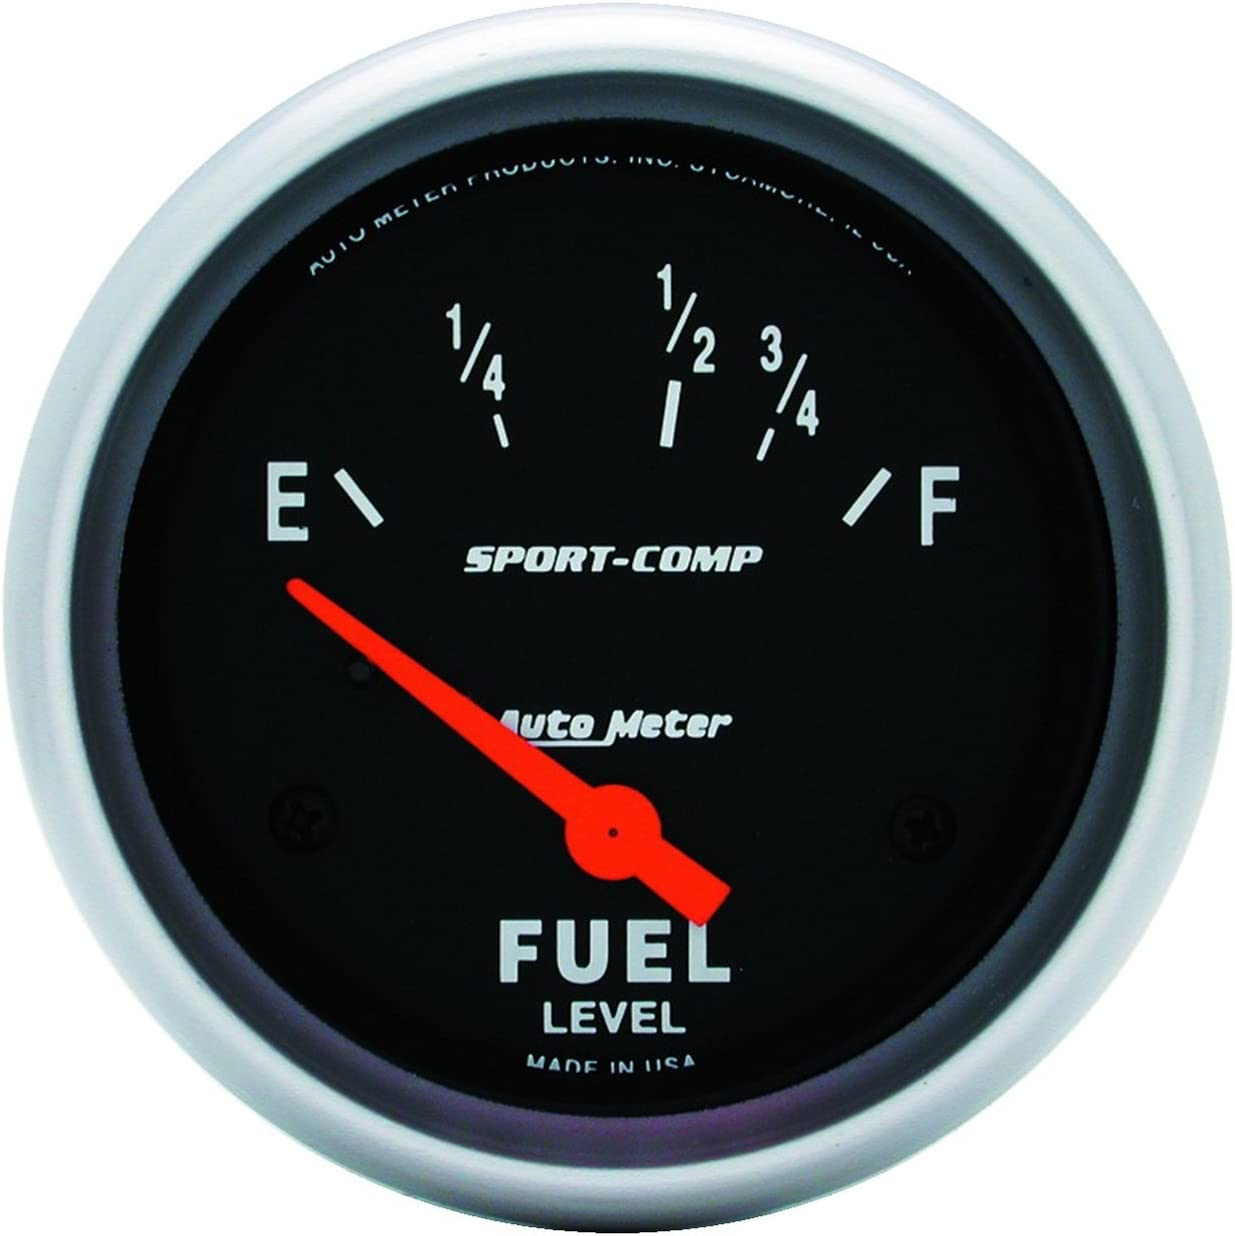 Auto Meter 3518 Sport-Comp Electric Fuel Level Gauge